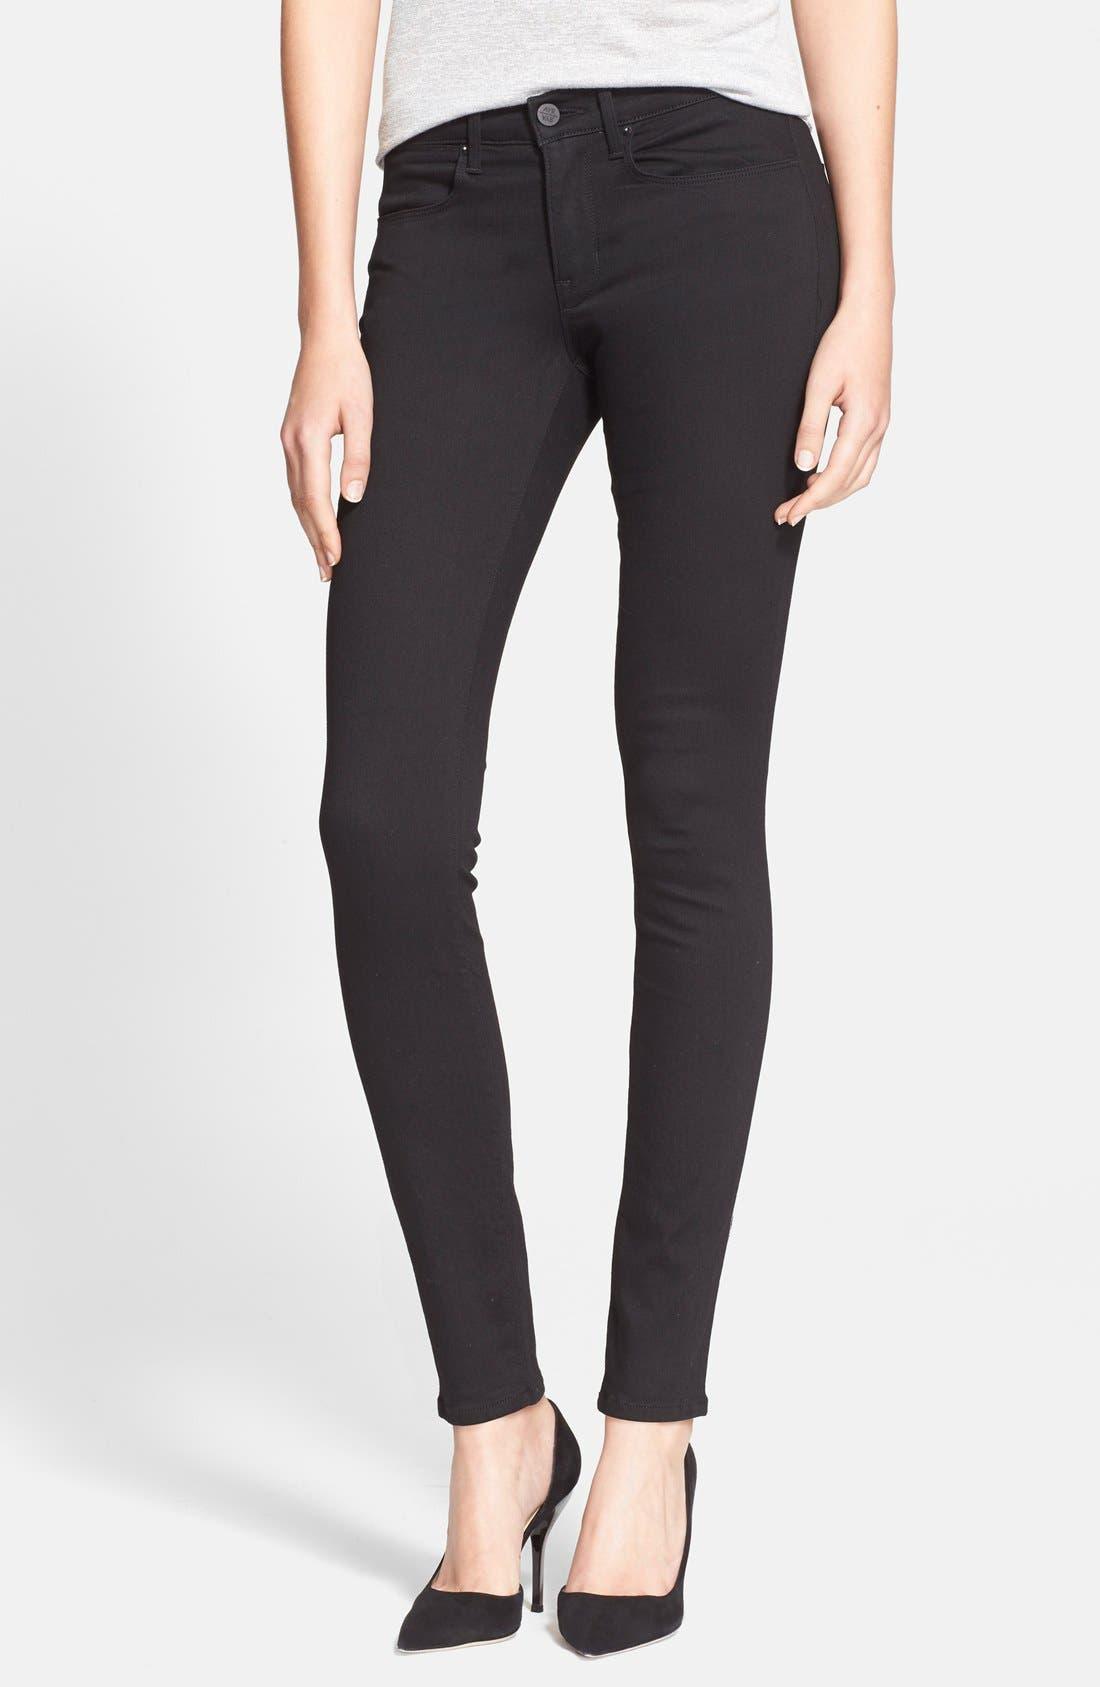 Alternate Image 1 Selected - AYR 'The Skinny' Skinny Jeans (Jet Black)